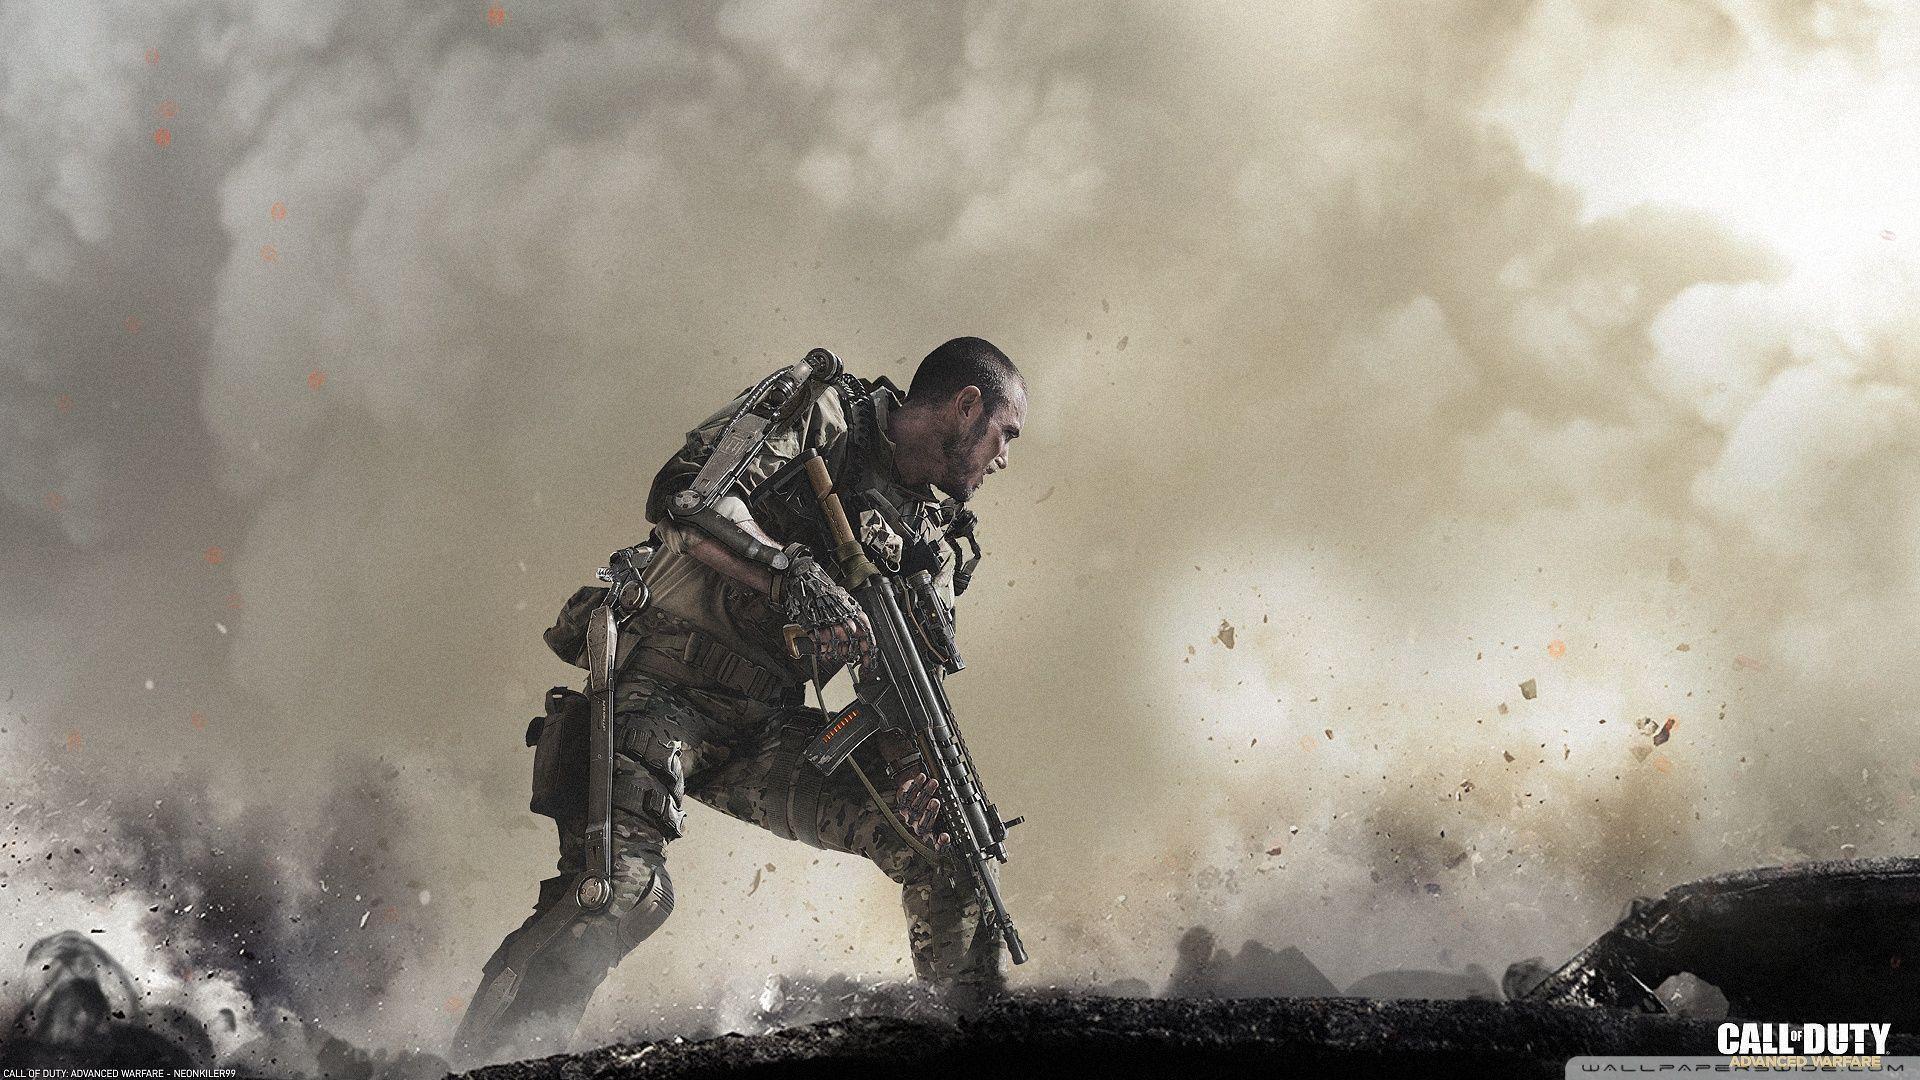 Call Of Duty: Advanced Warfare HD Wallpapers - Wallpaper Cave